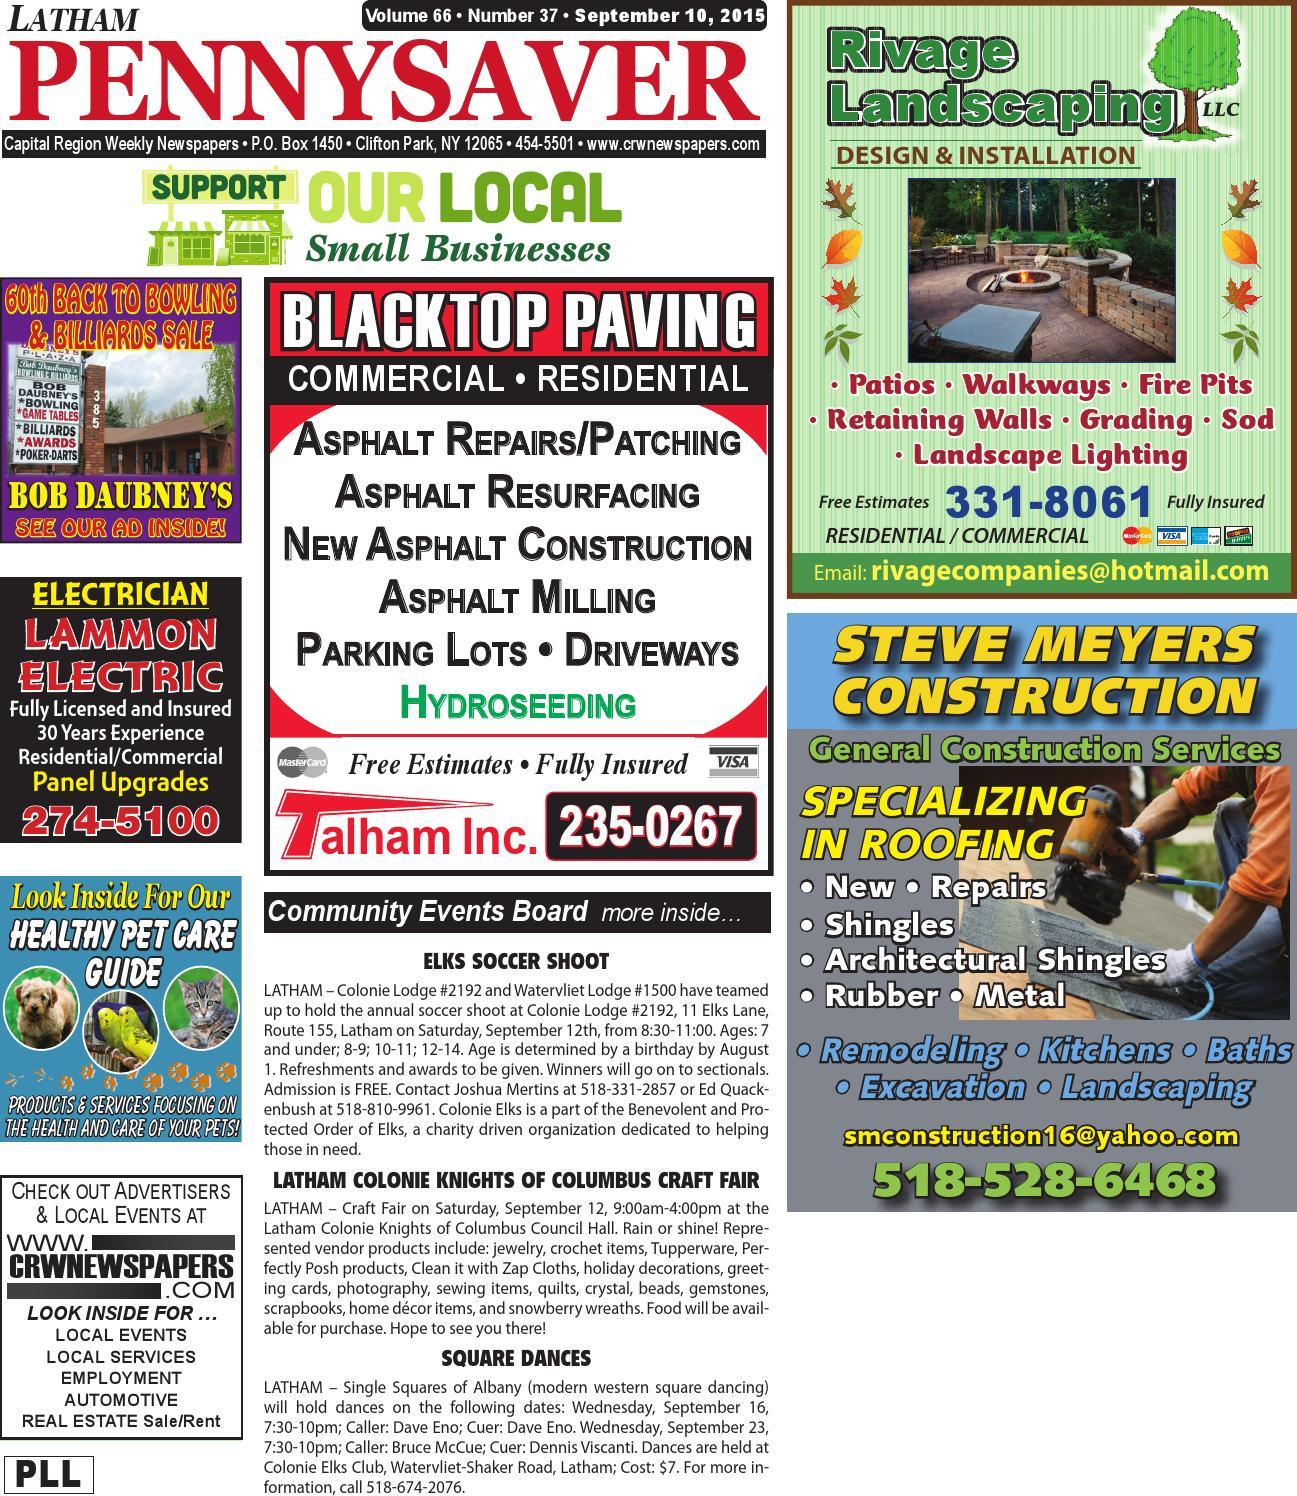 latham pennysaver 091015 by capital region weekly newspapers issuu